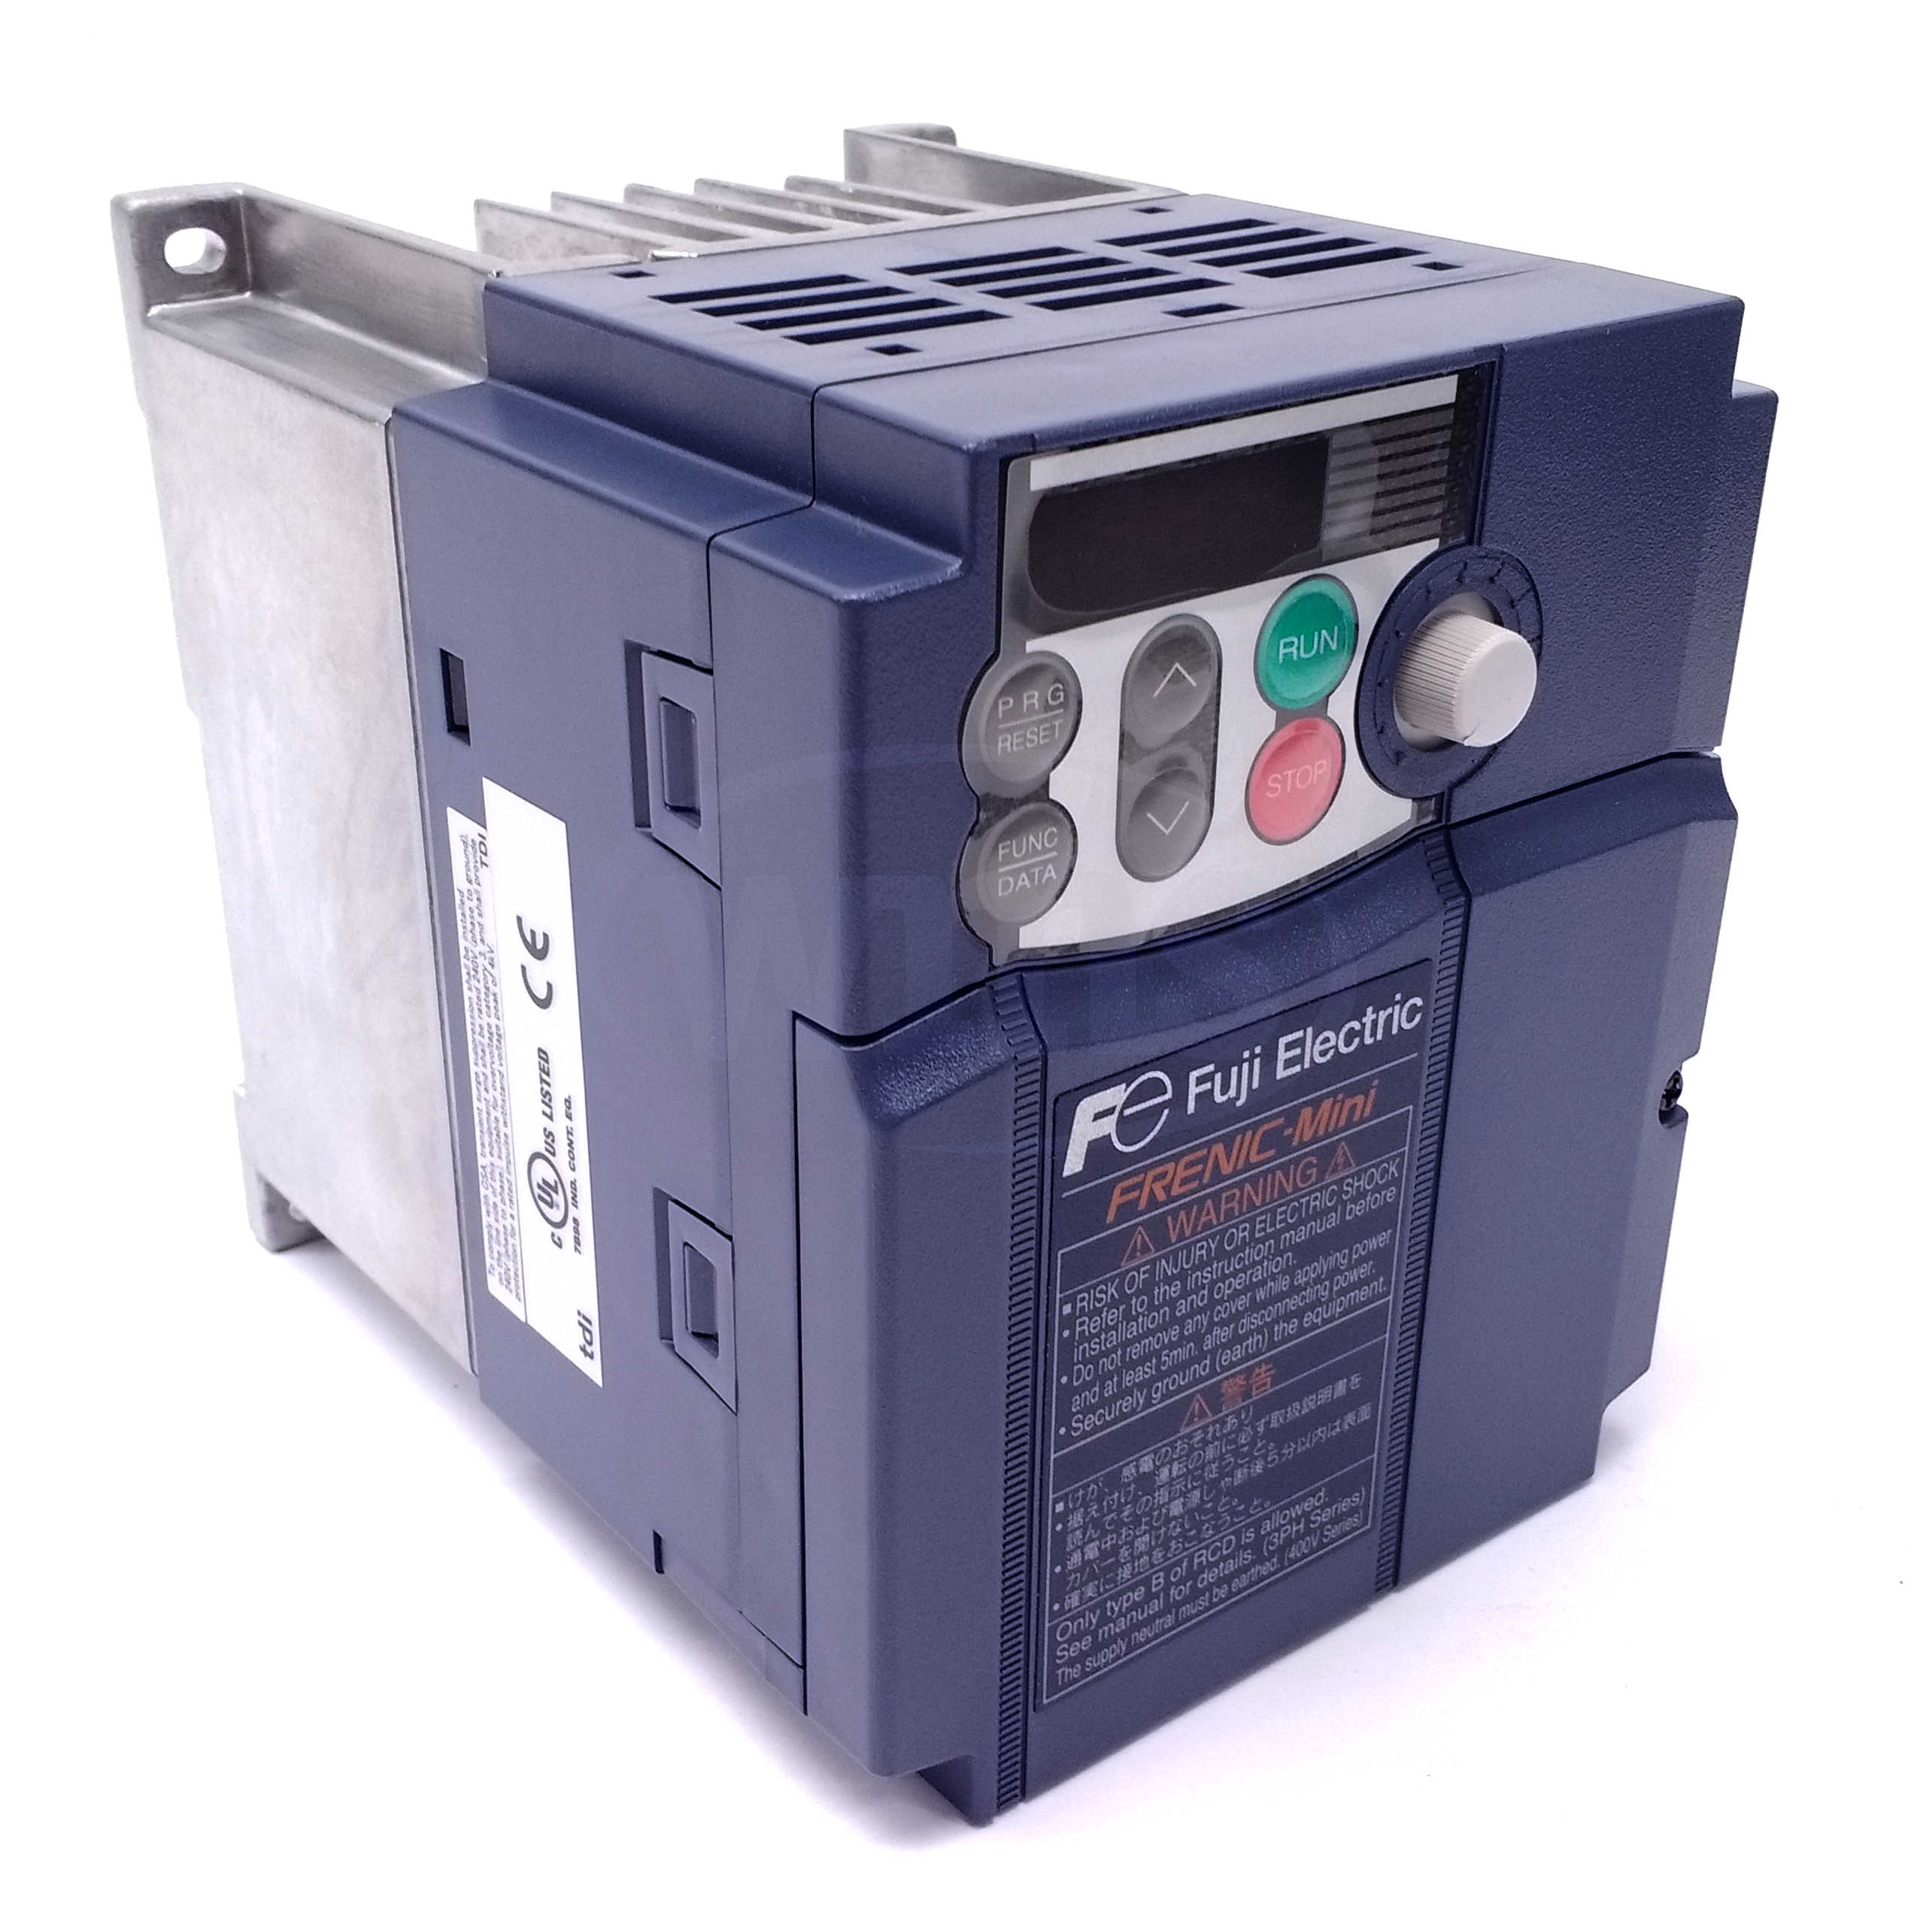 NEMA1-C2-201 Fuji NEMA//UL Type 1 Conversion Kit